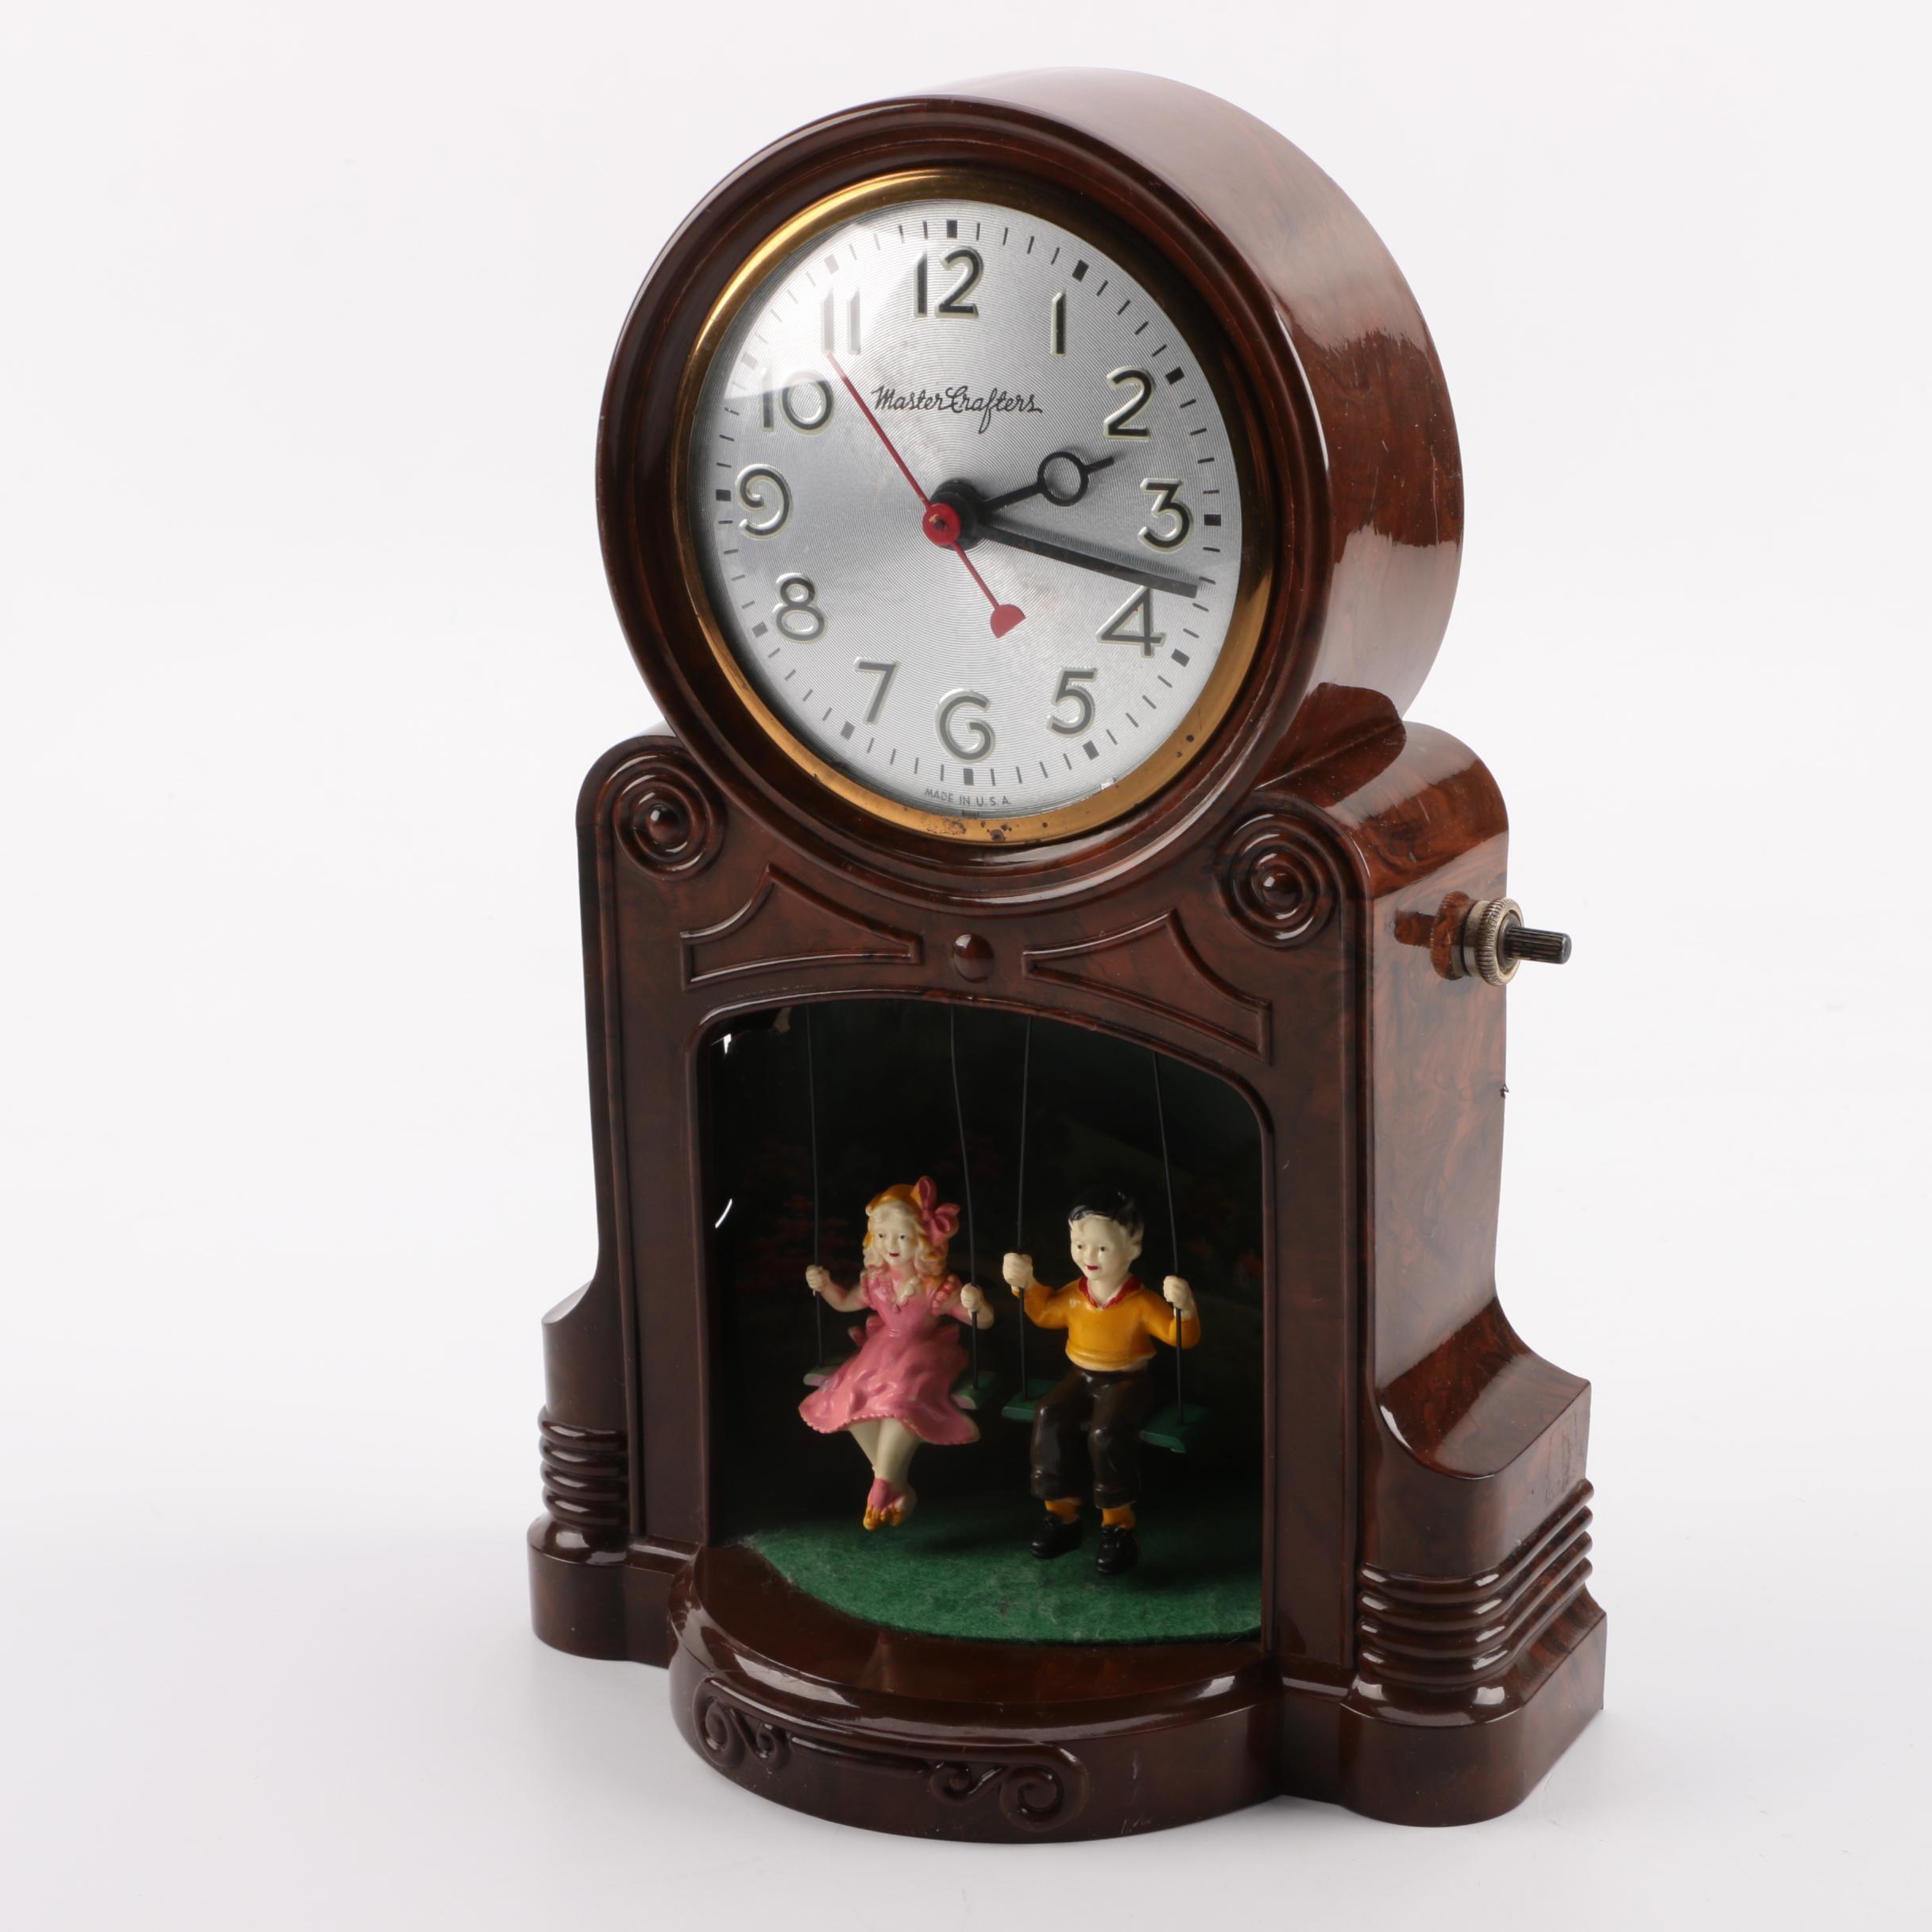 MasterCrafters Illuminated Swing Electric Clock